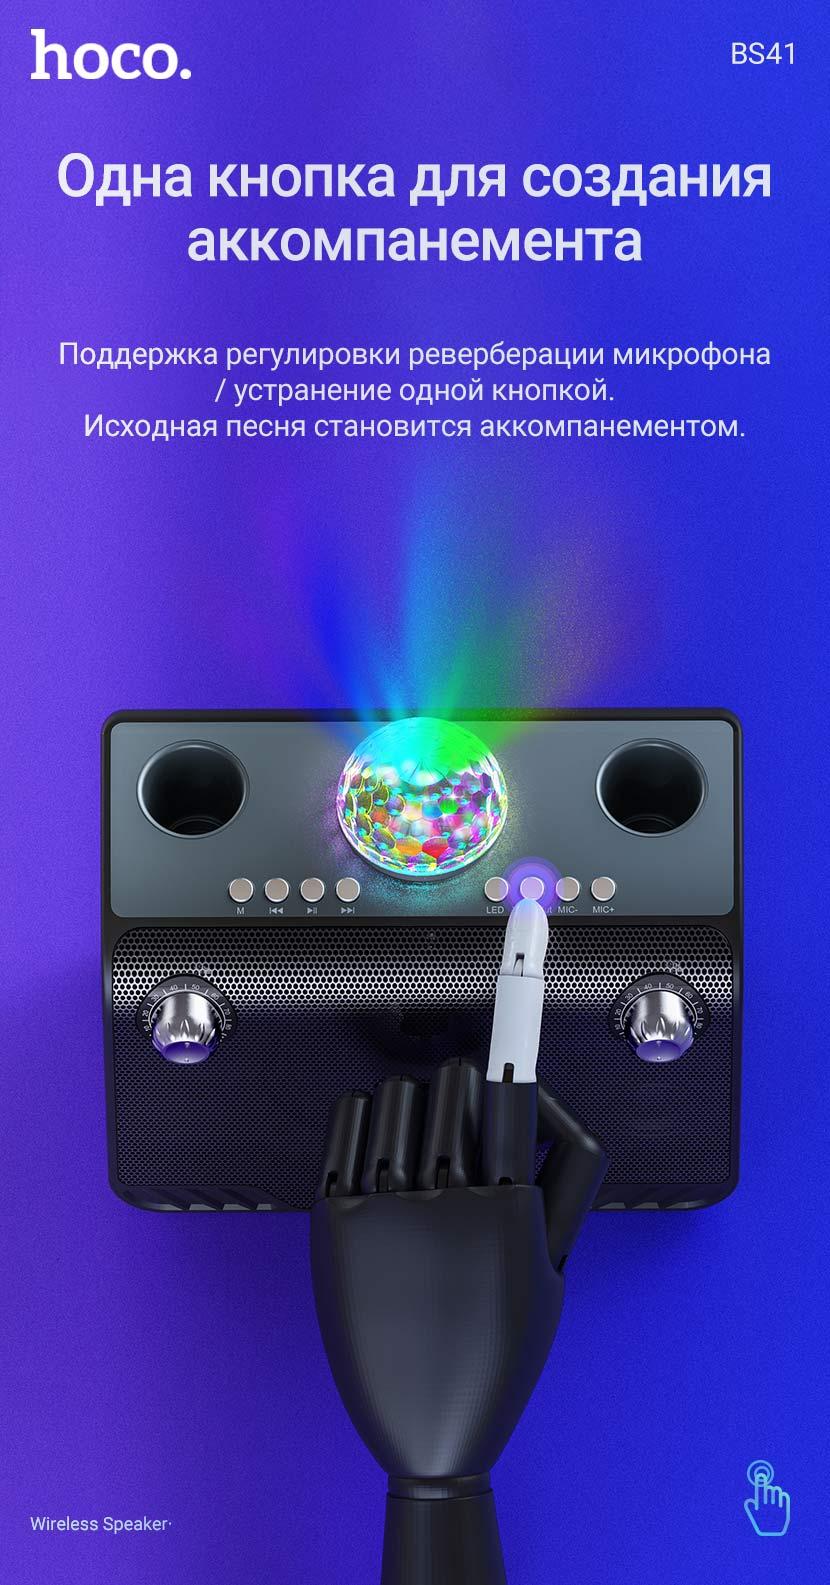 hoco news bs41 warm sound k song wireless speaker accompaniment ru